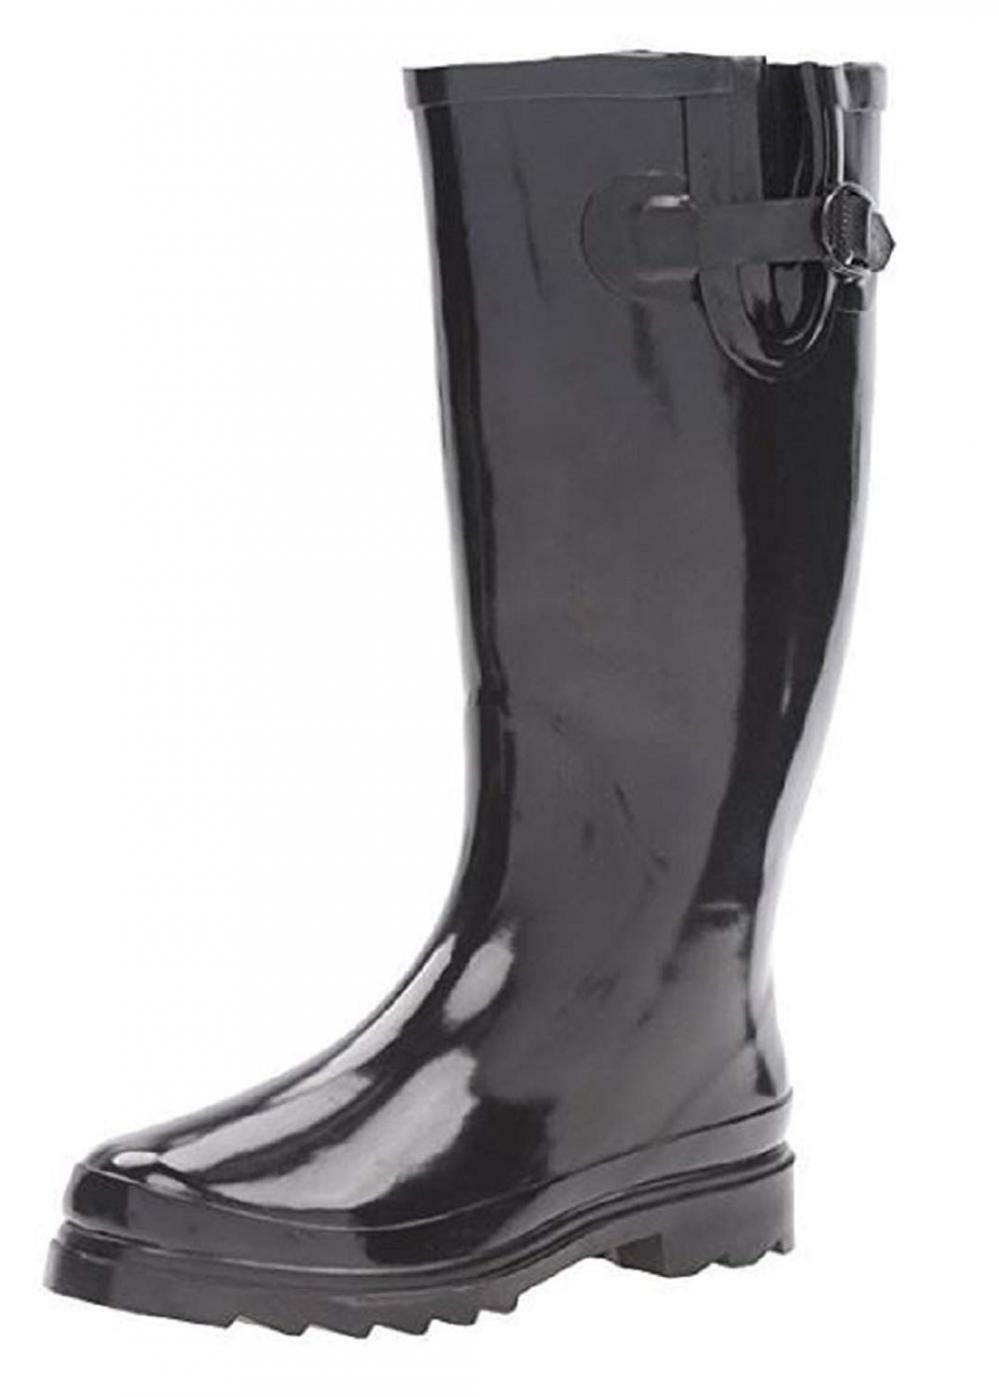 chaussures8teen chaussures 18 femmes Classic Rain démarrage